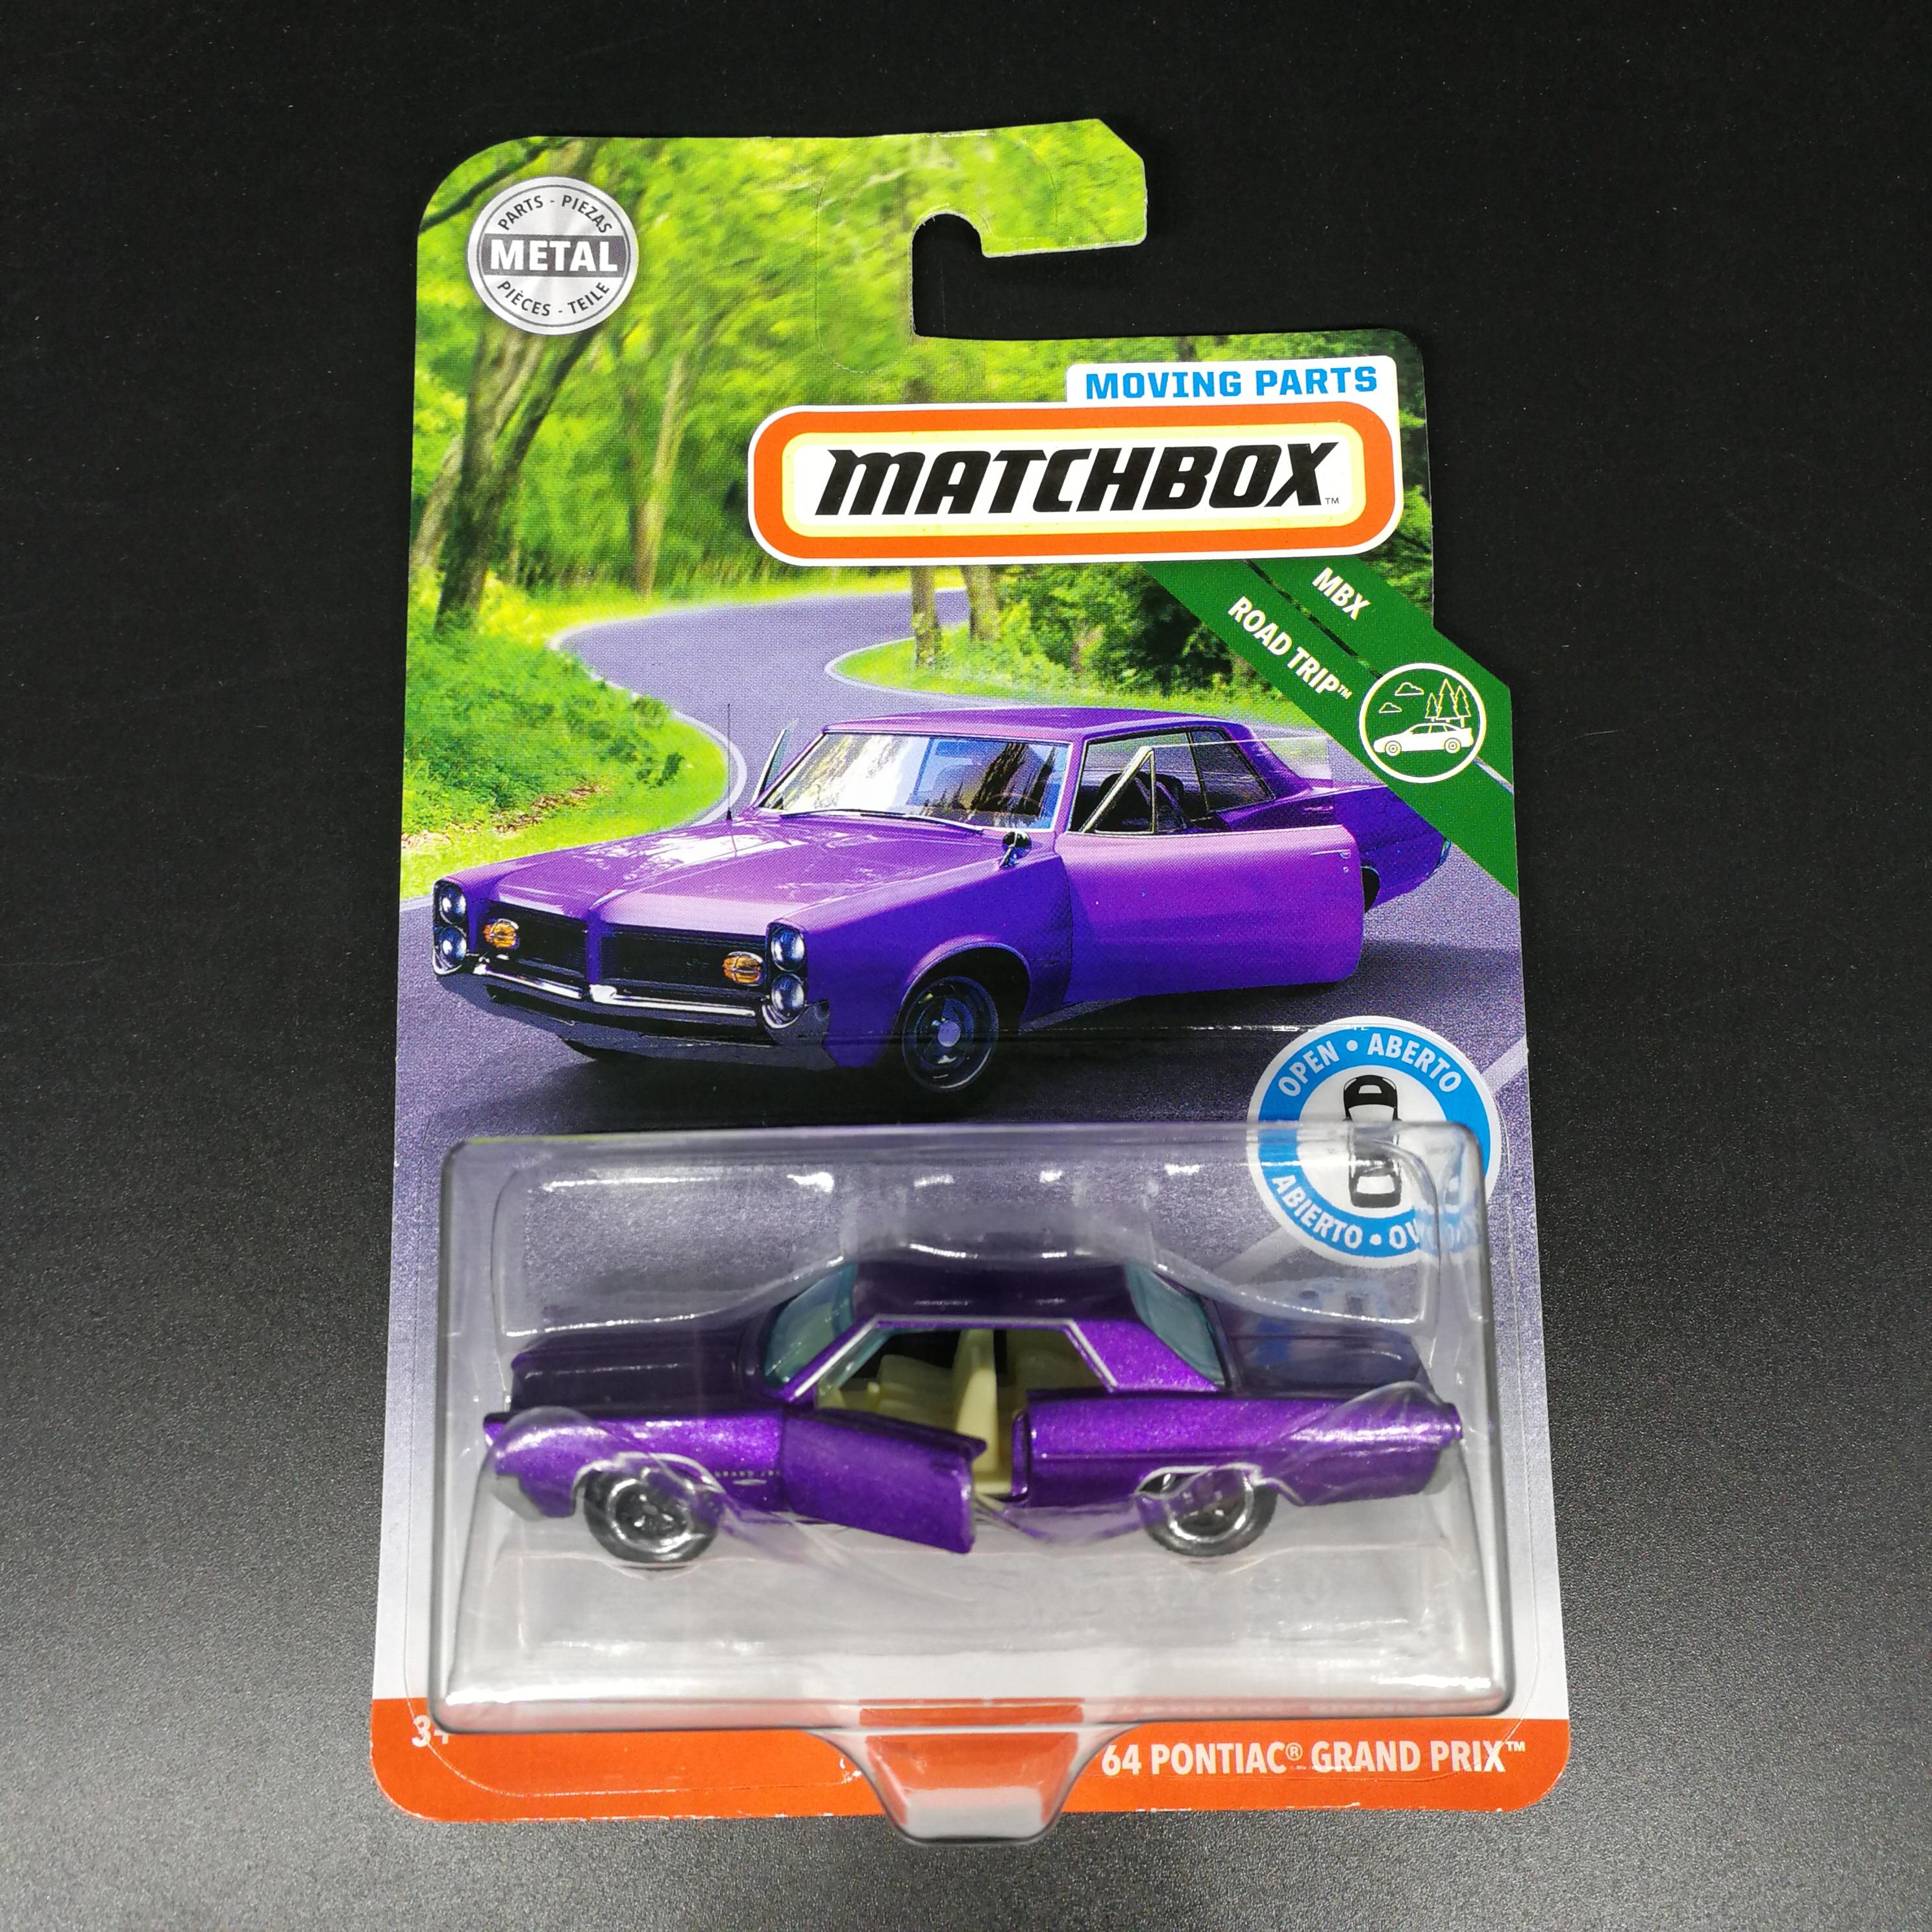 2019  Matchbox Car 1:64 Sports 64 PONTIAC GRAND PRIX  Metal Material Body Race Car Collection Alloy Car Gift